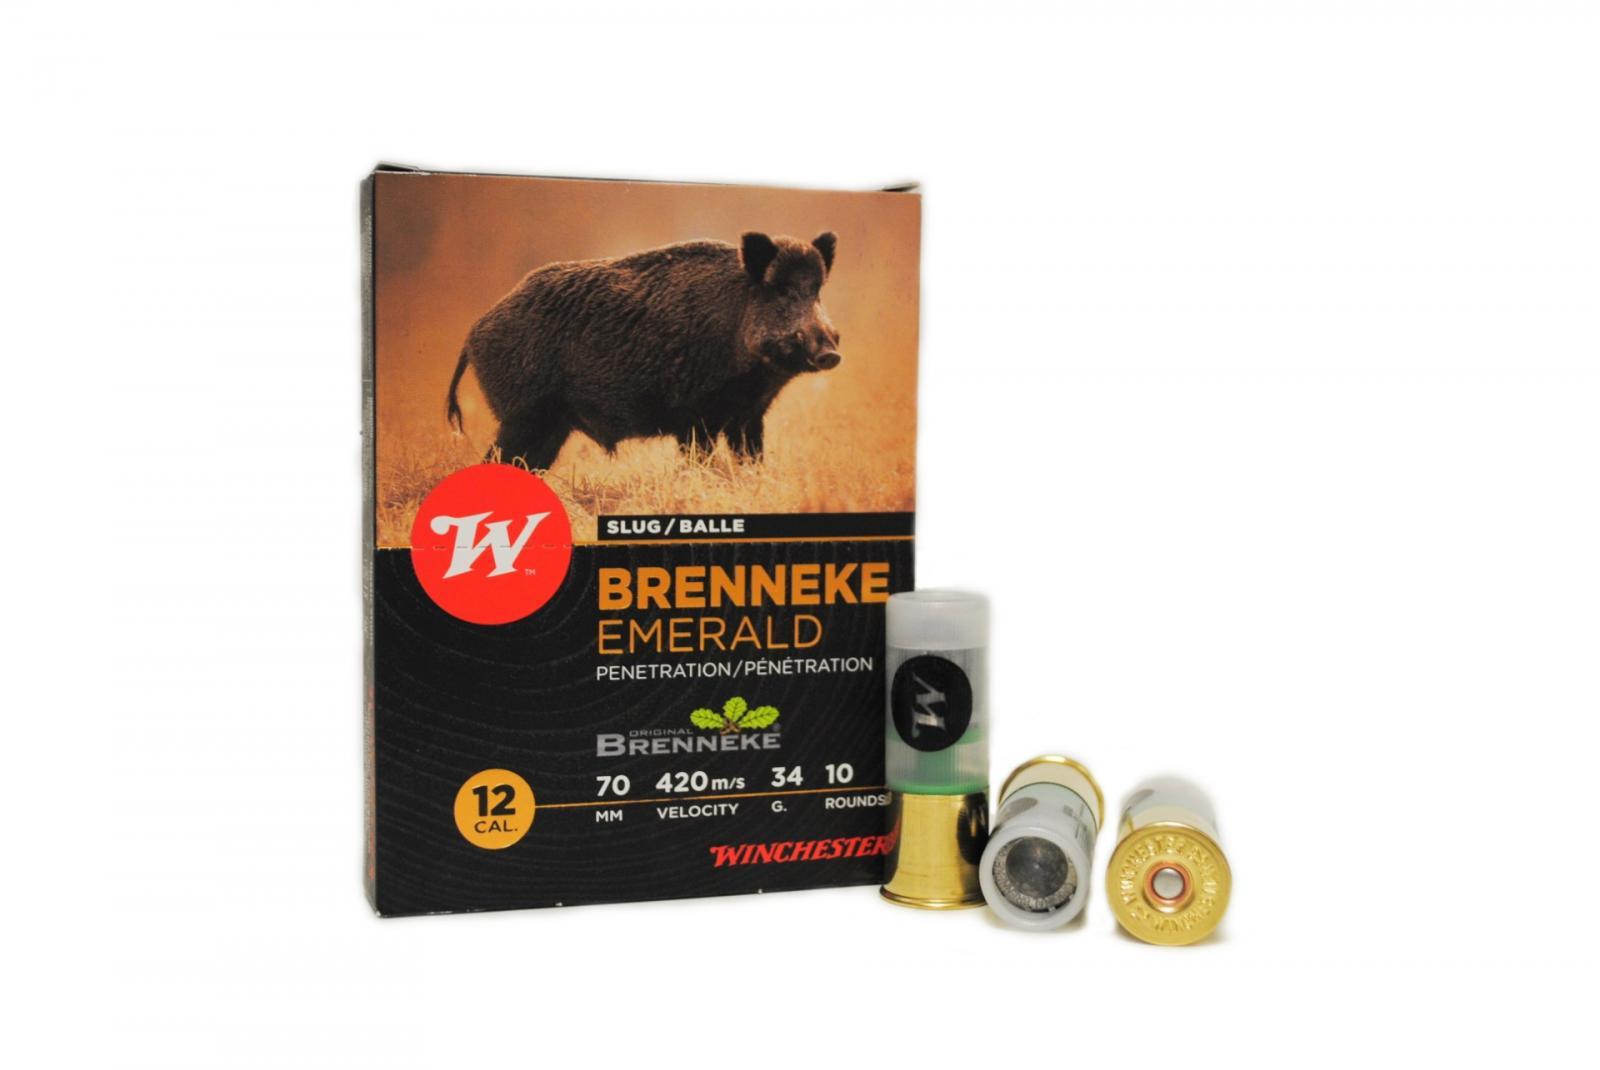 Boite de 10 balles WINCHESTER BRENNEKE calibre 12 / 70 HBK